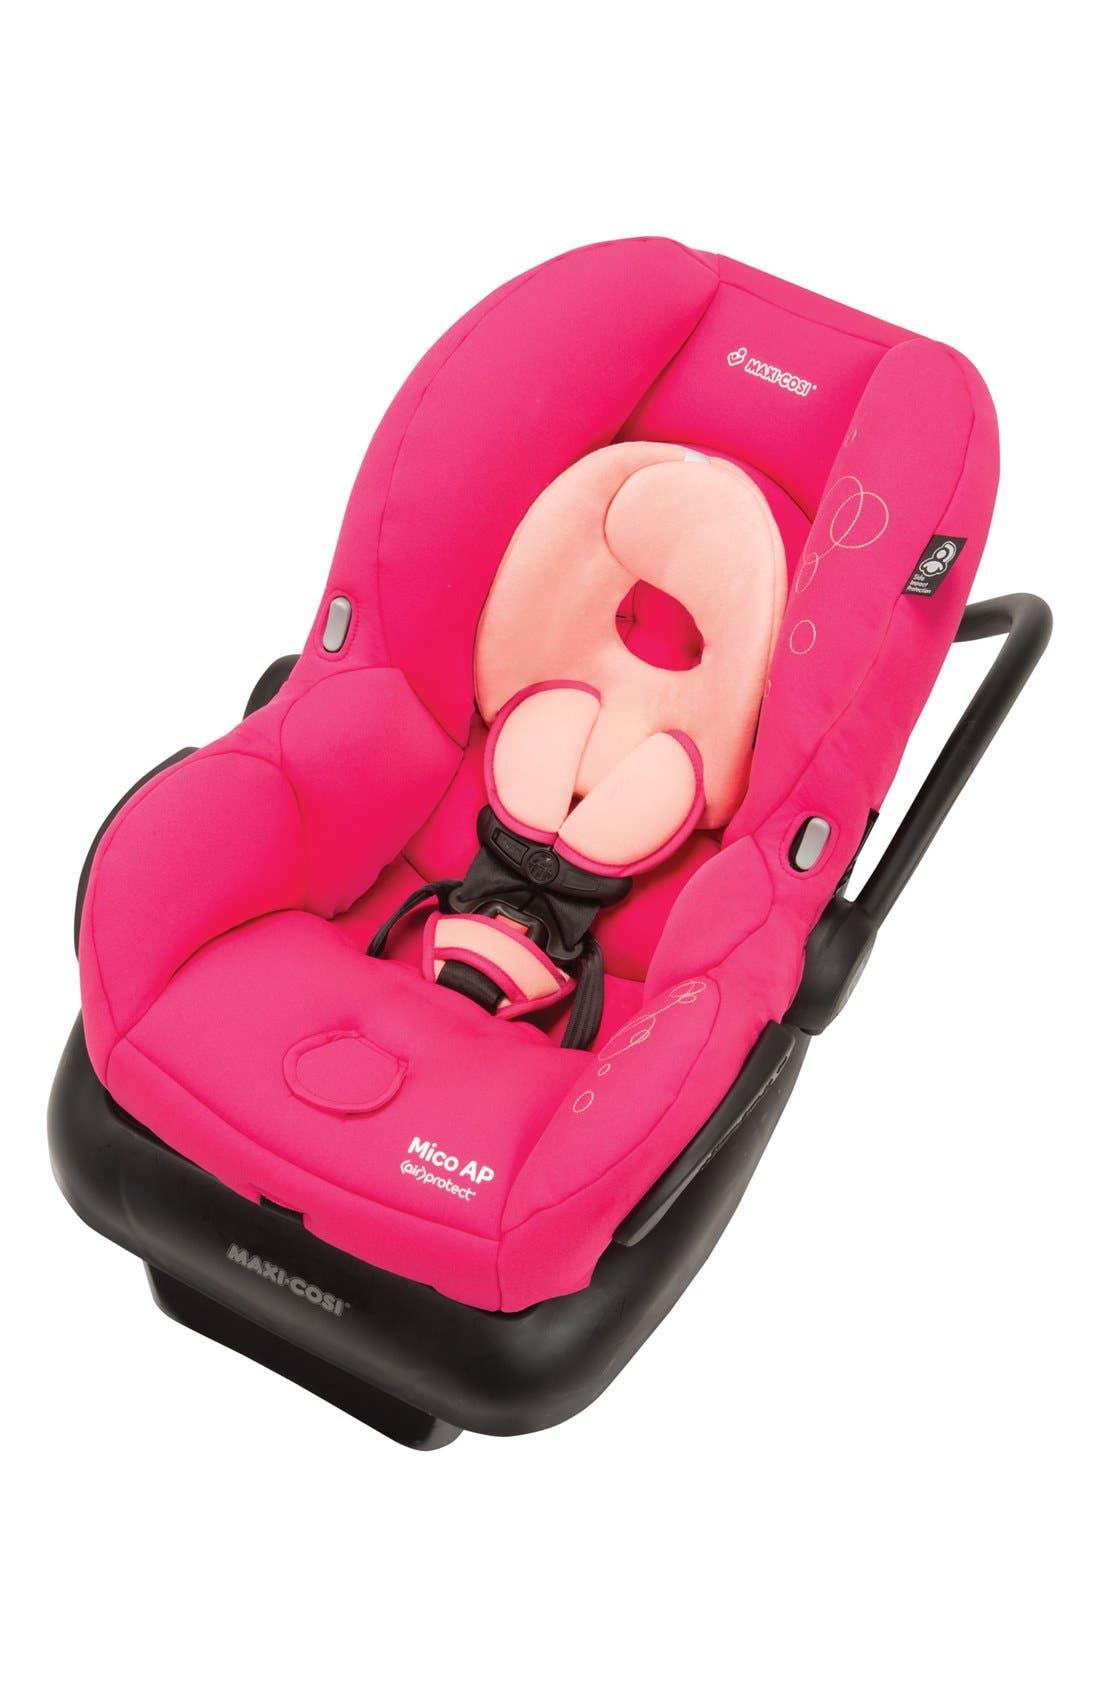 Mico AP Infant Car Seat & Base,                             Alternate thumbnail 13, color,